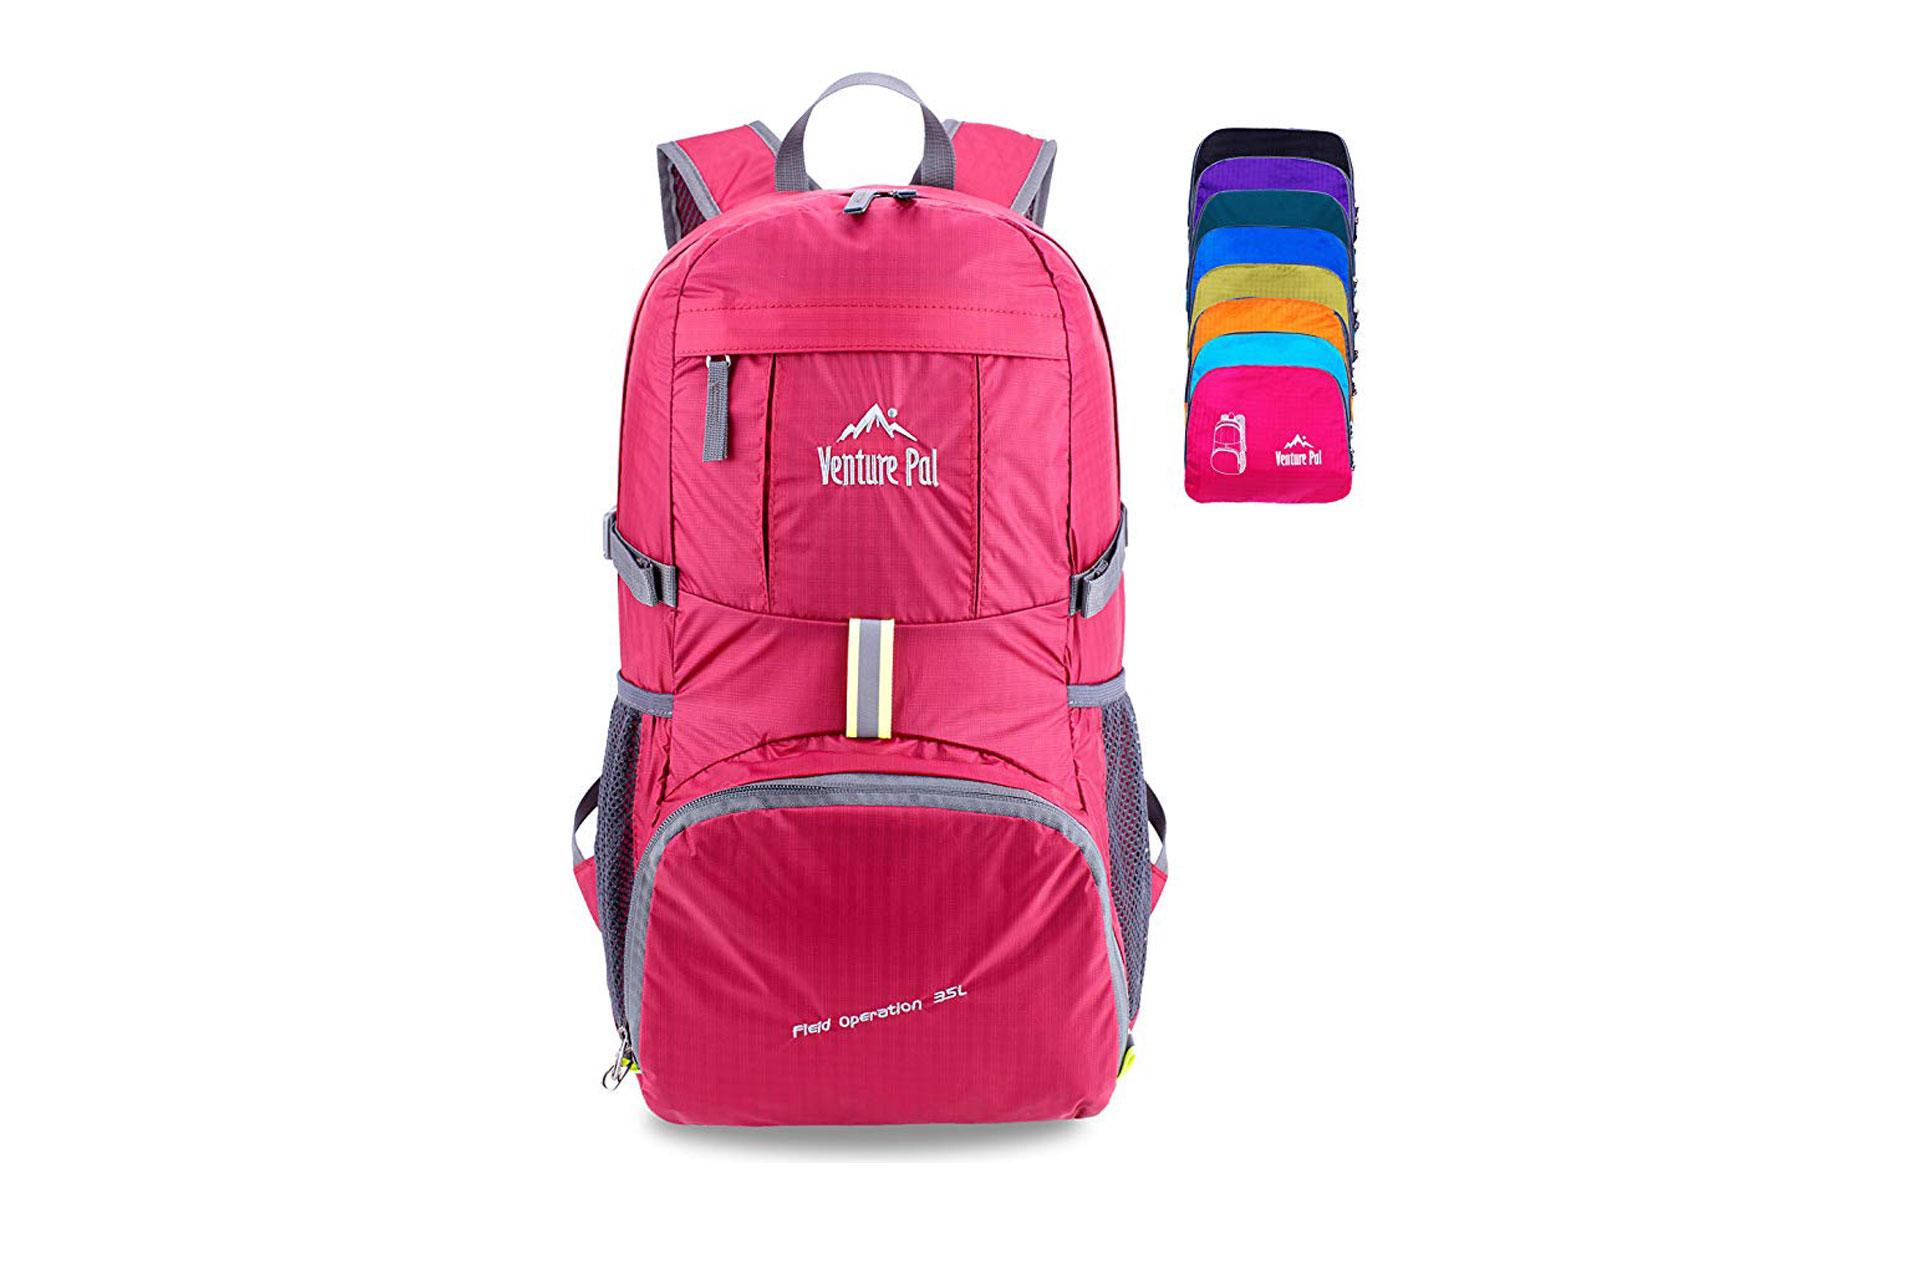 Venture Backpack; Courtesy of Amazon